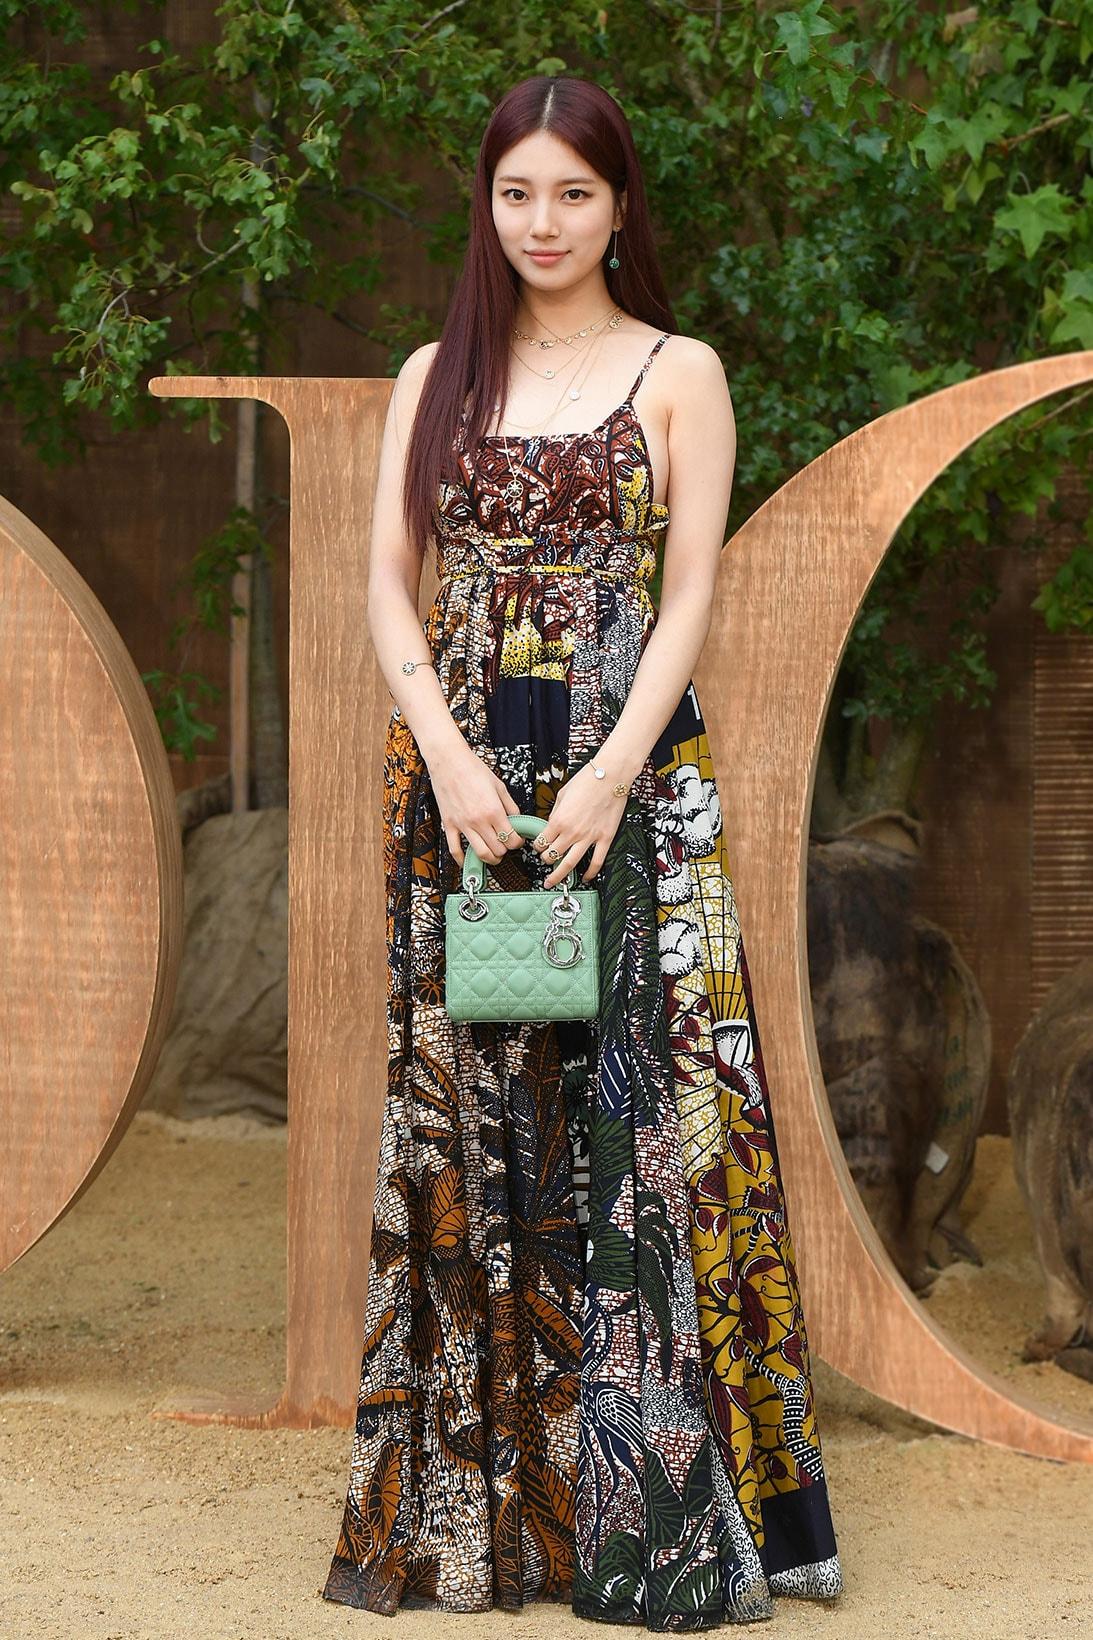 suzy bae start-up k-drama netflix facts missa k-pop dior ambassador south korea